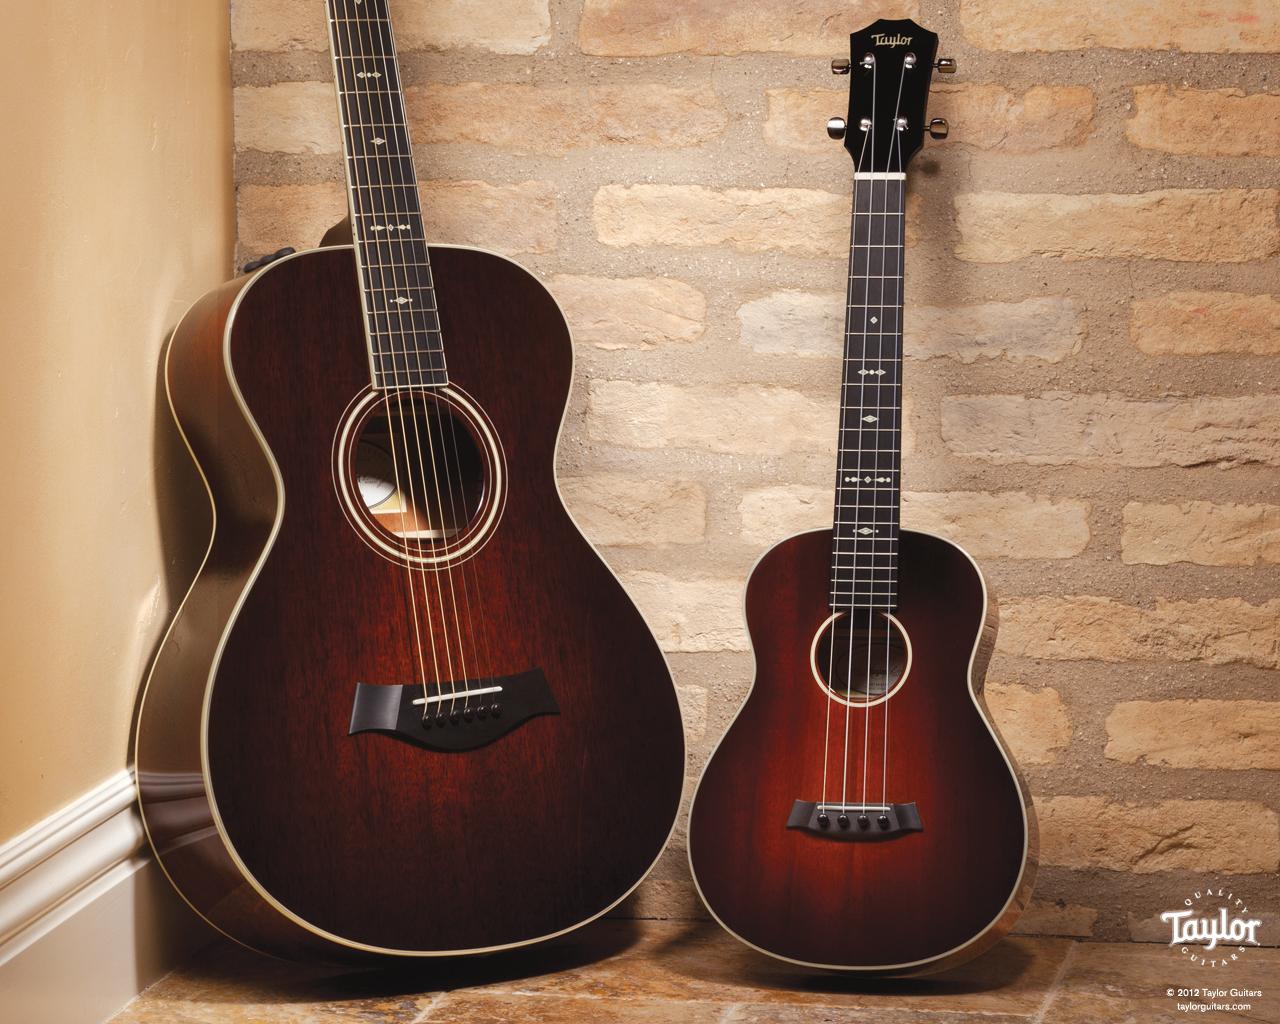 taylor guitars wallpapers - photo #20